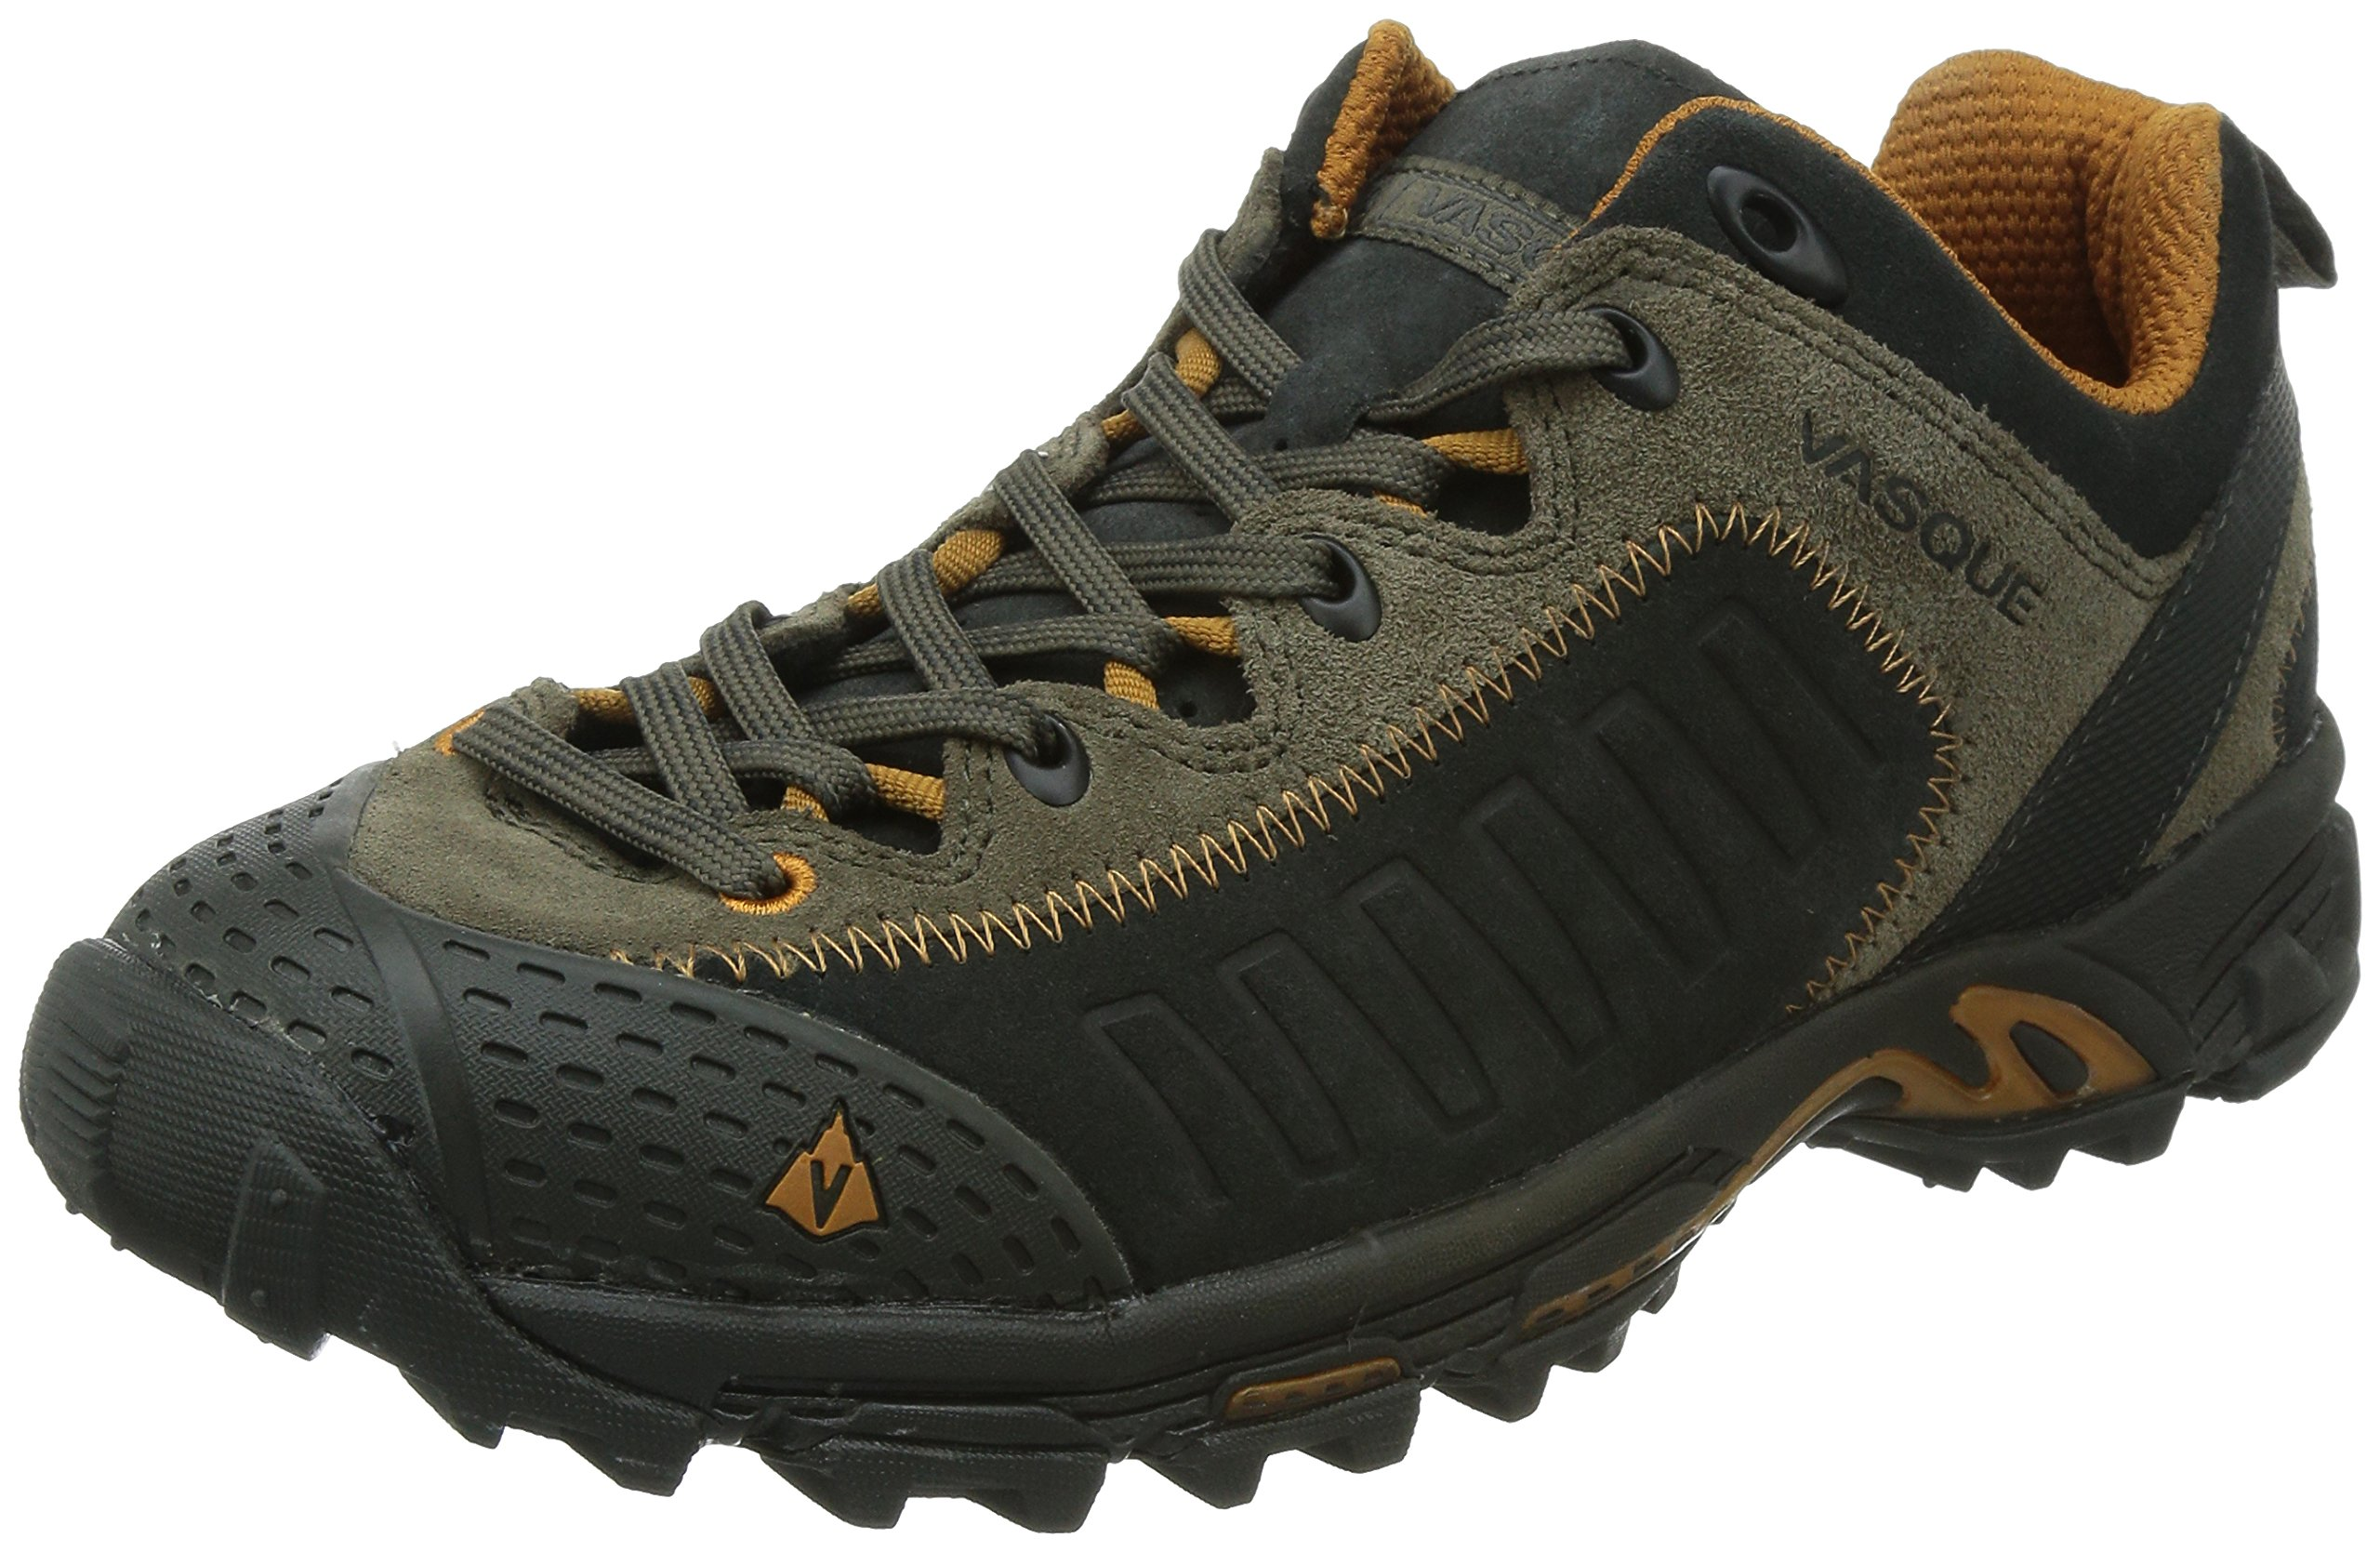 Vasque Men's Juxt Multisport Shoe,Peat/Sudan Brown,13 M